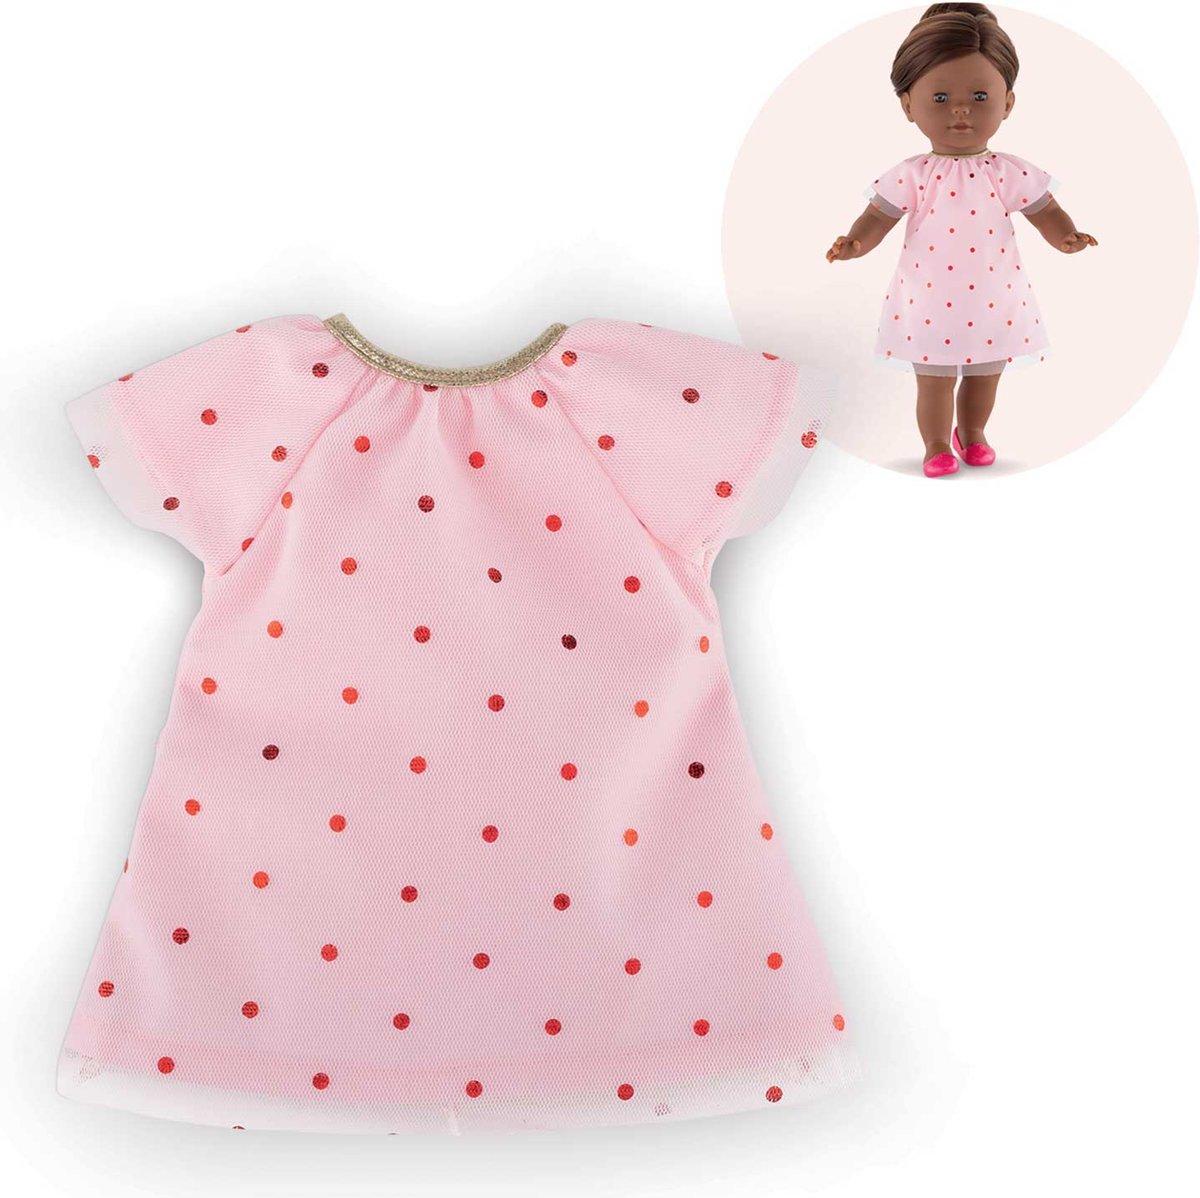 Corolle Ma Corolle kleding Dress - Happy Reindeer 36 cm